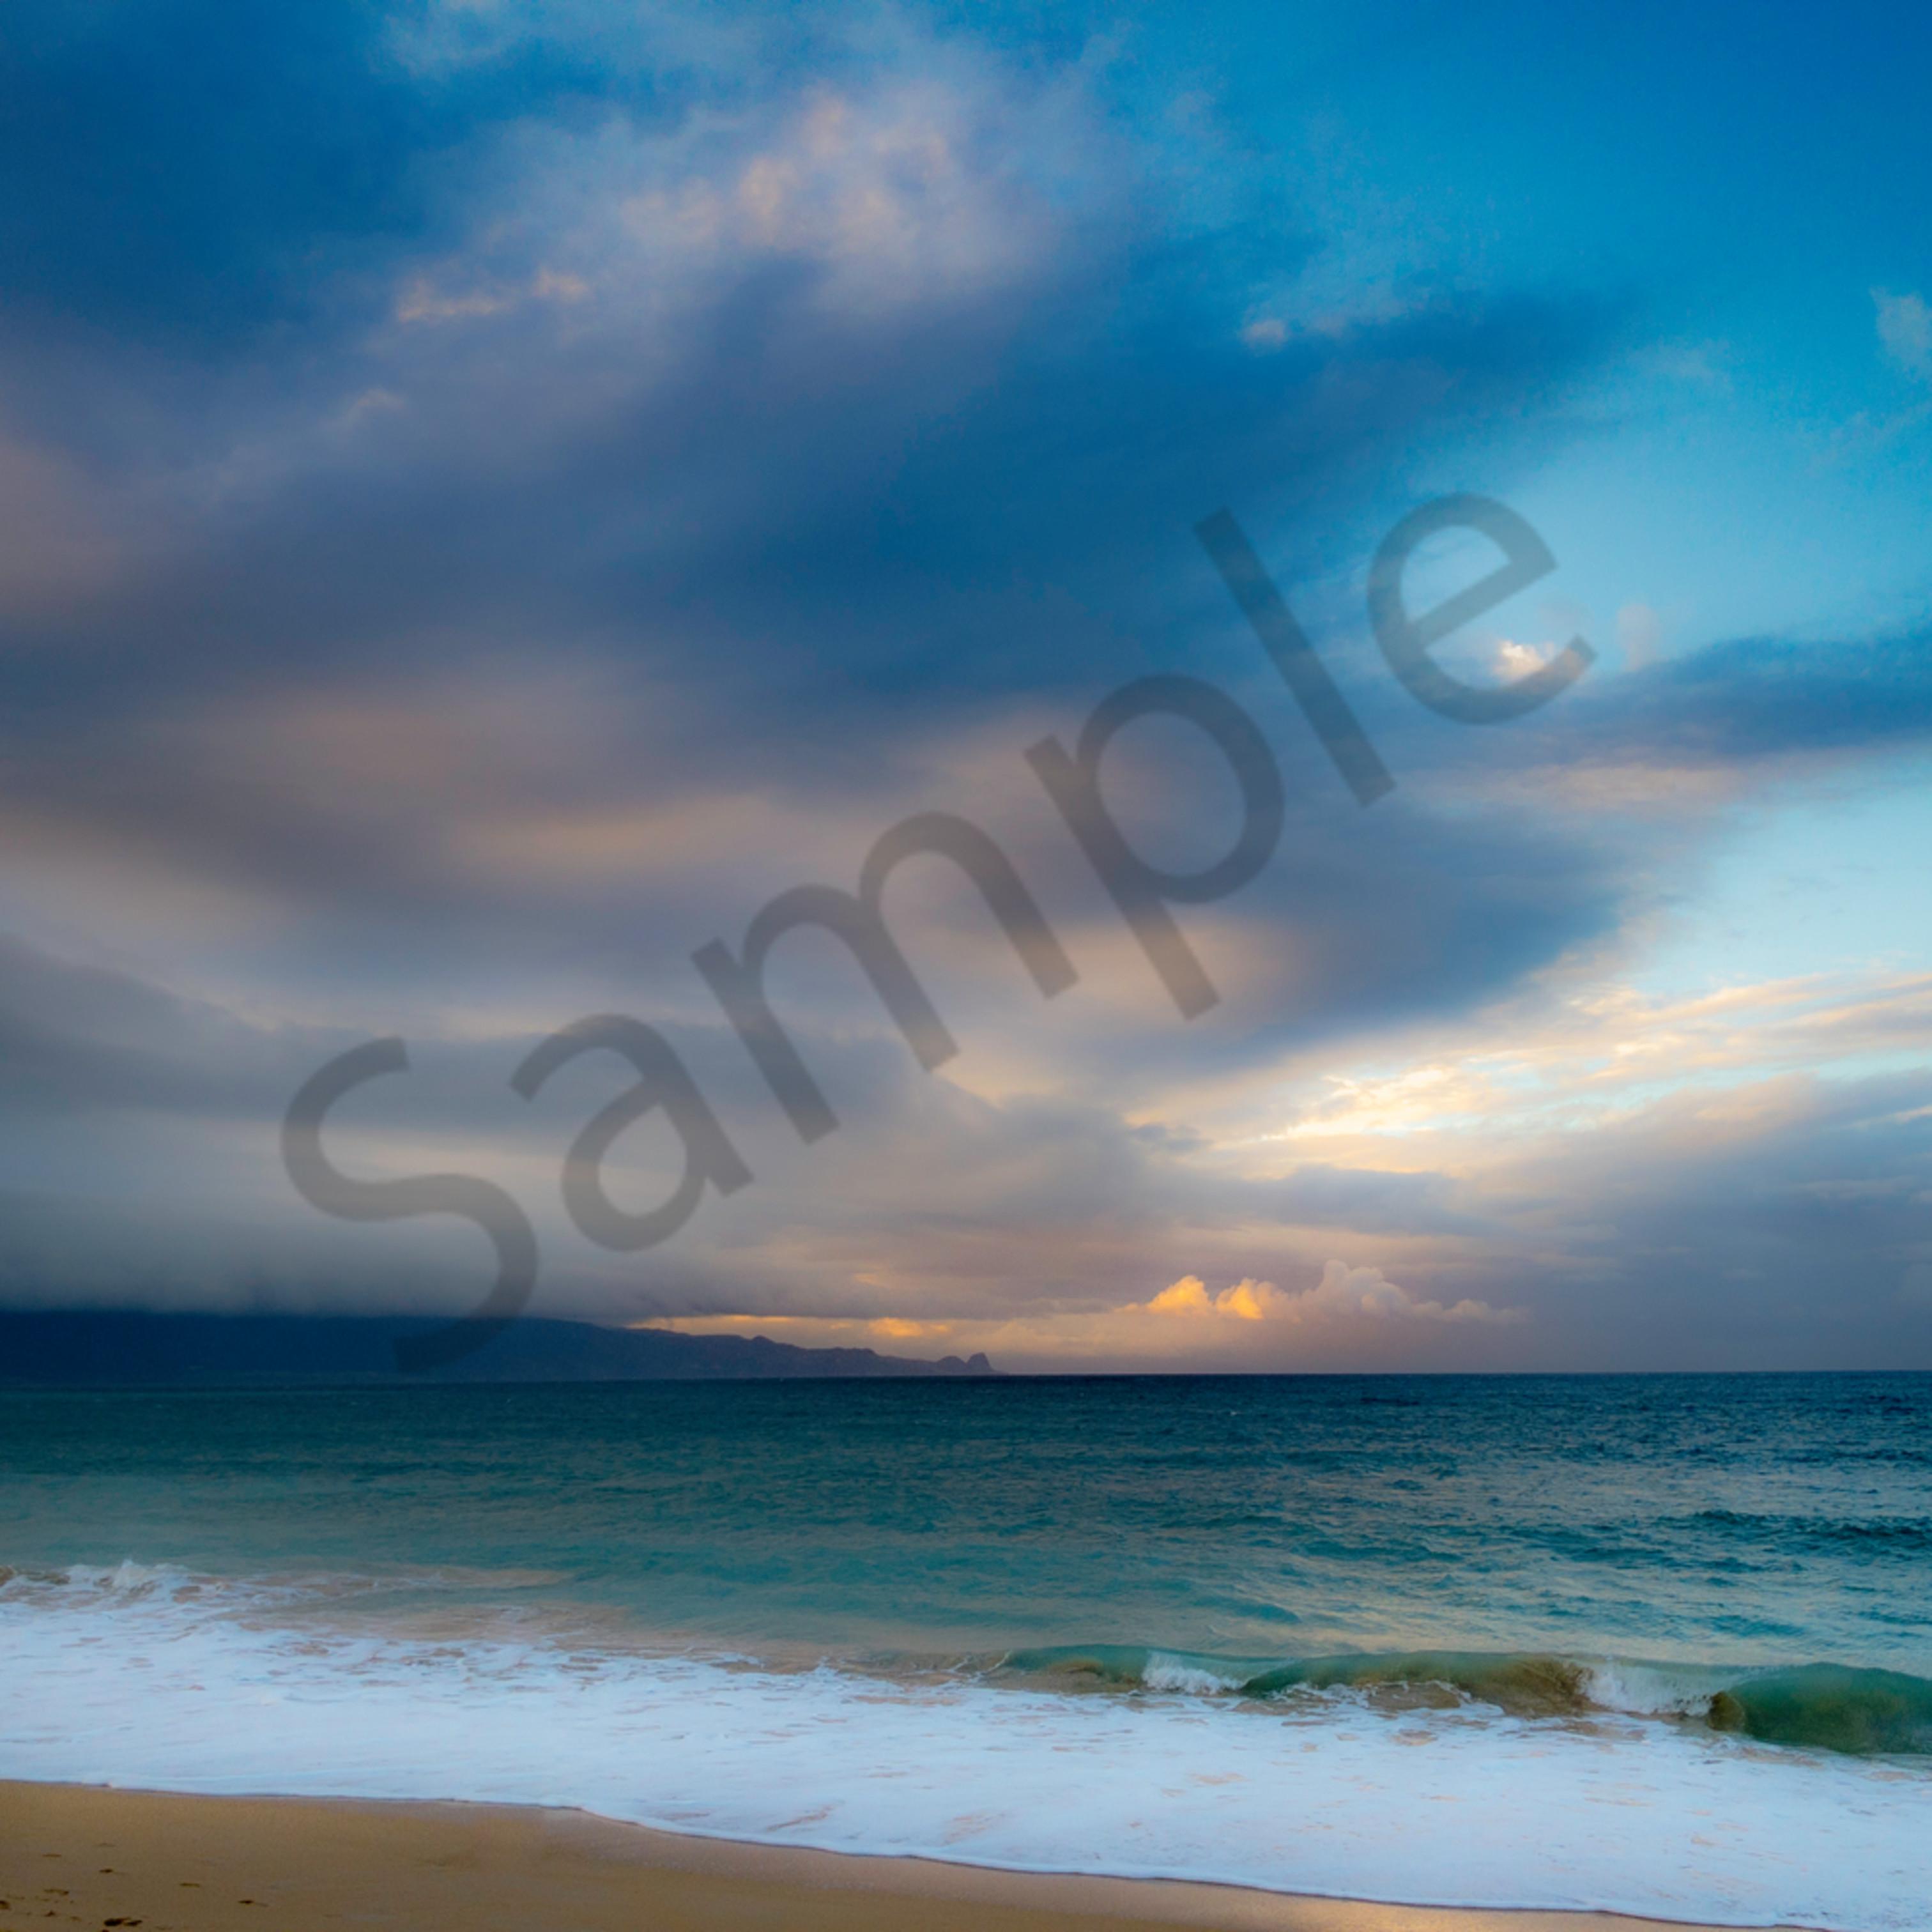 Maui clouds 003 xq6iir